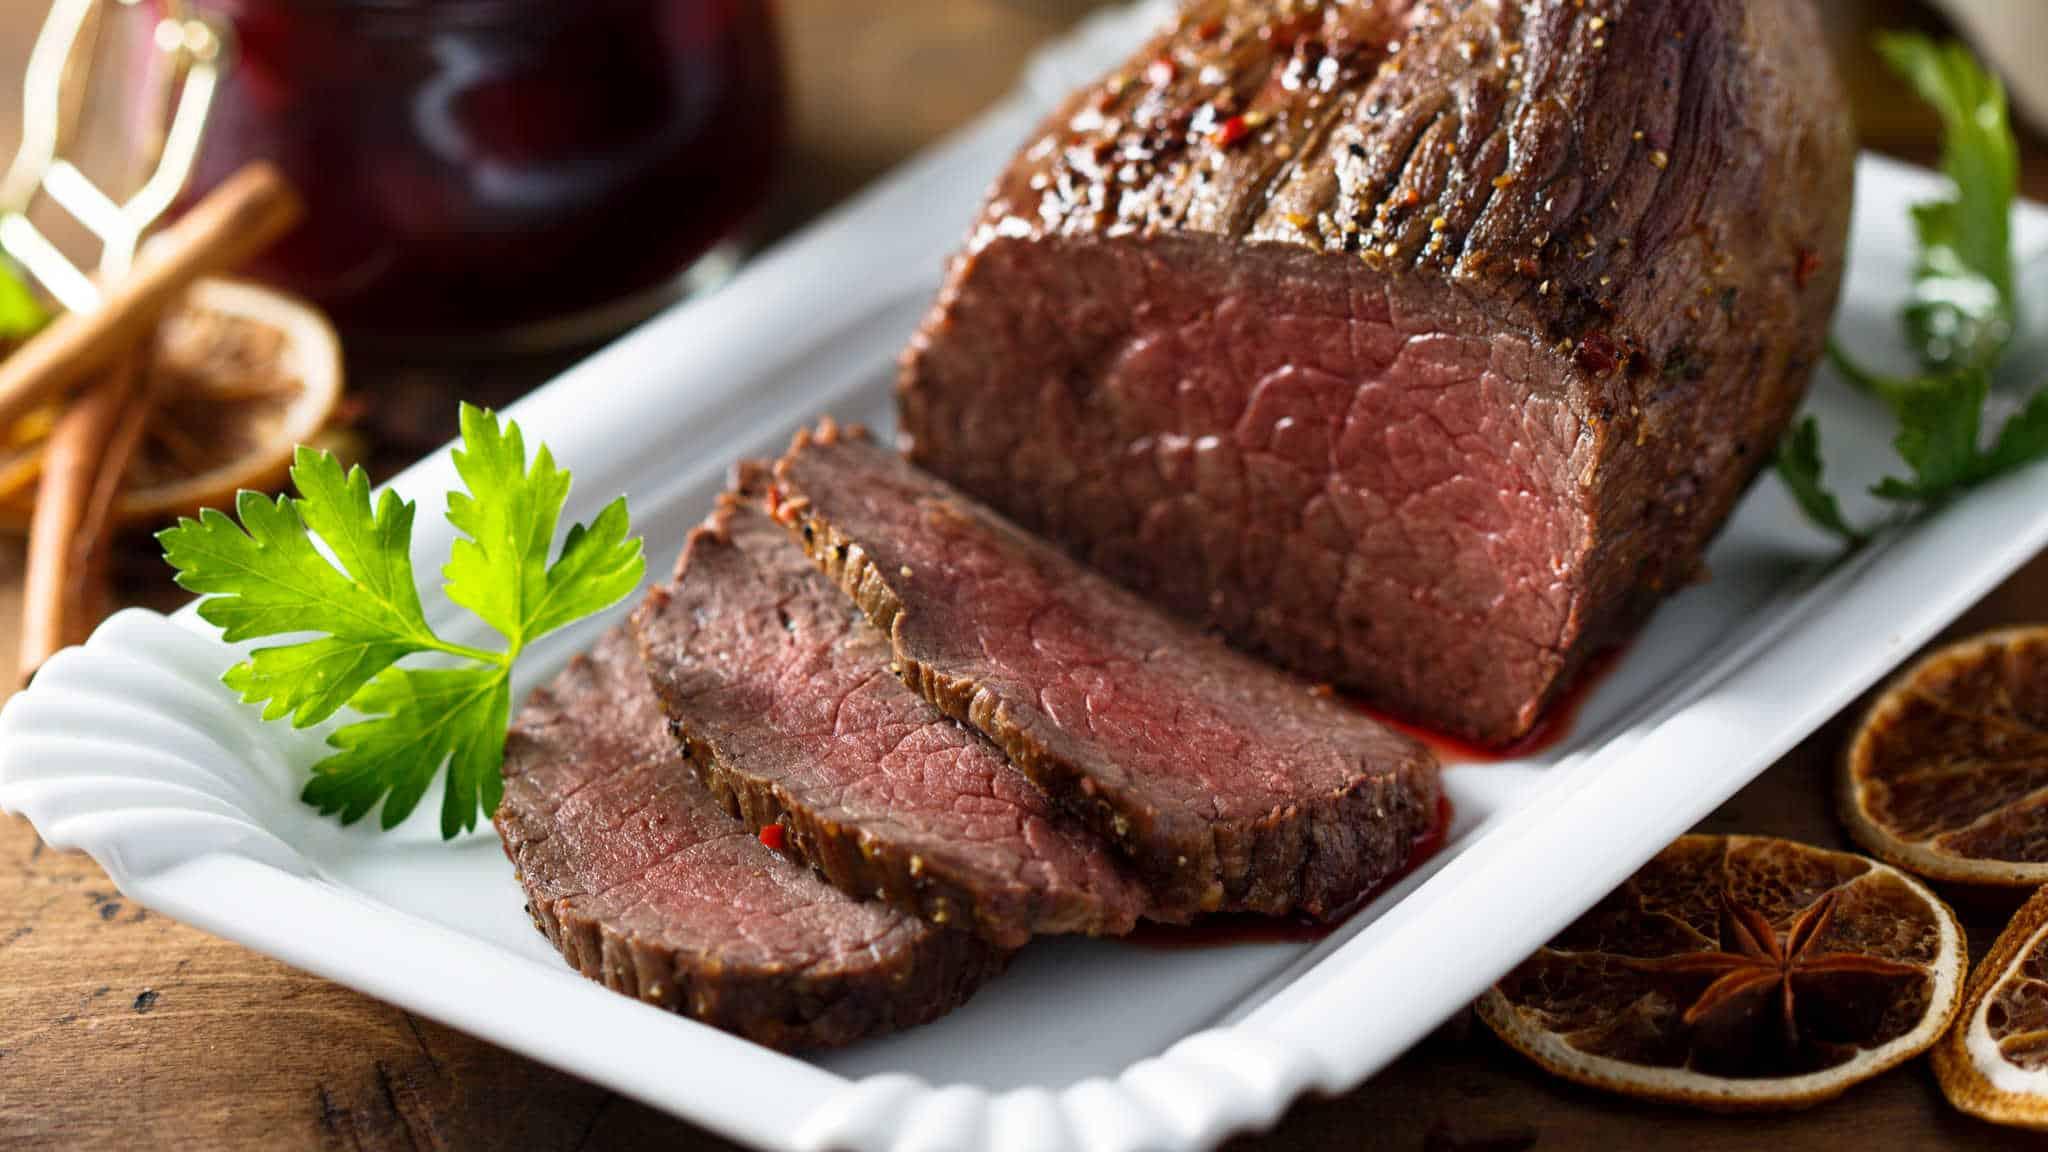 צלי בשר חגיגי באדיבות חלי